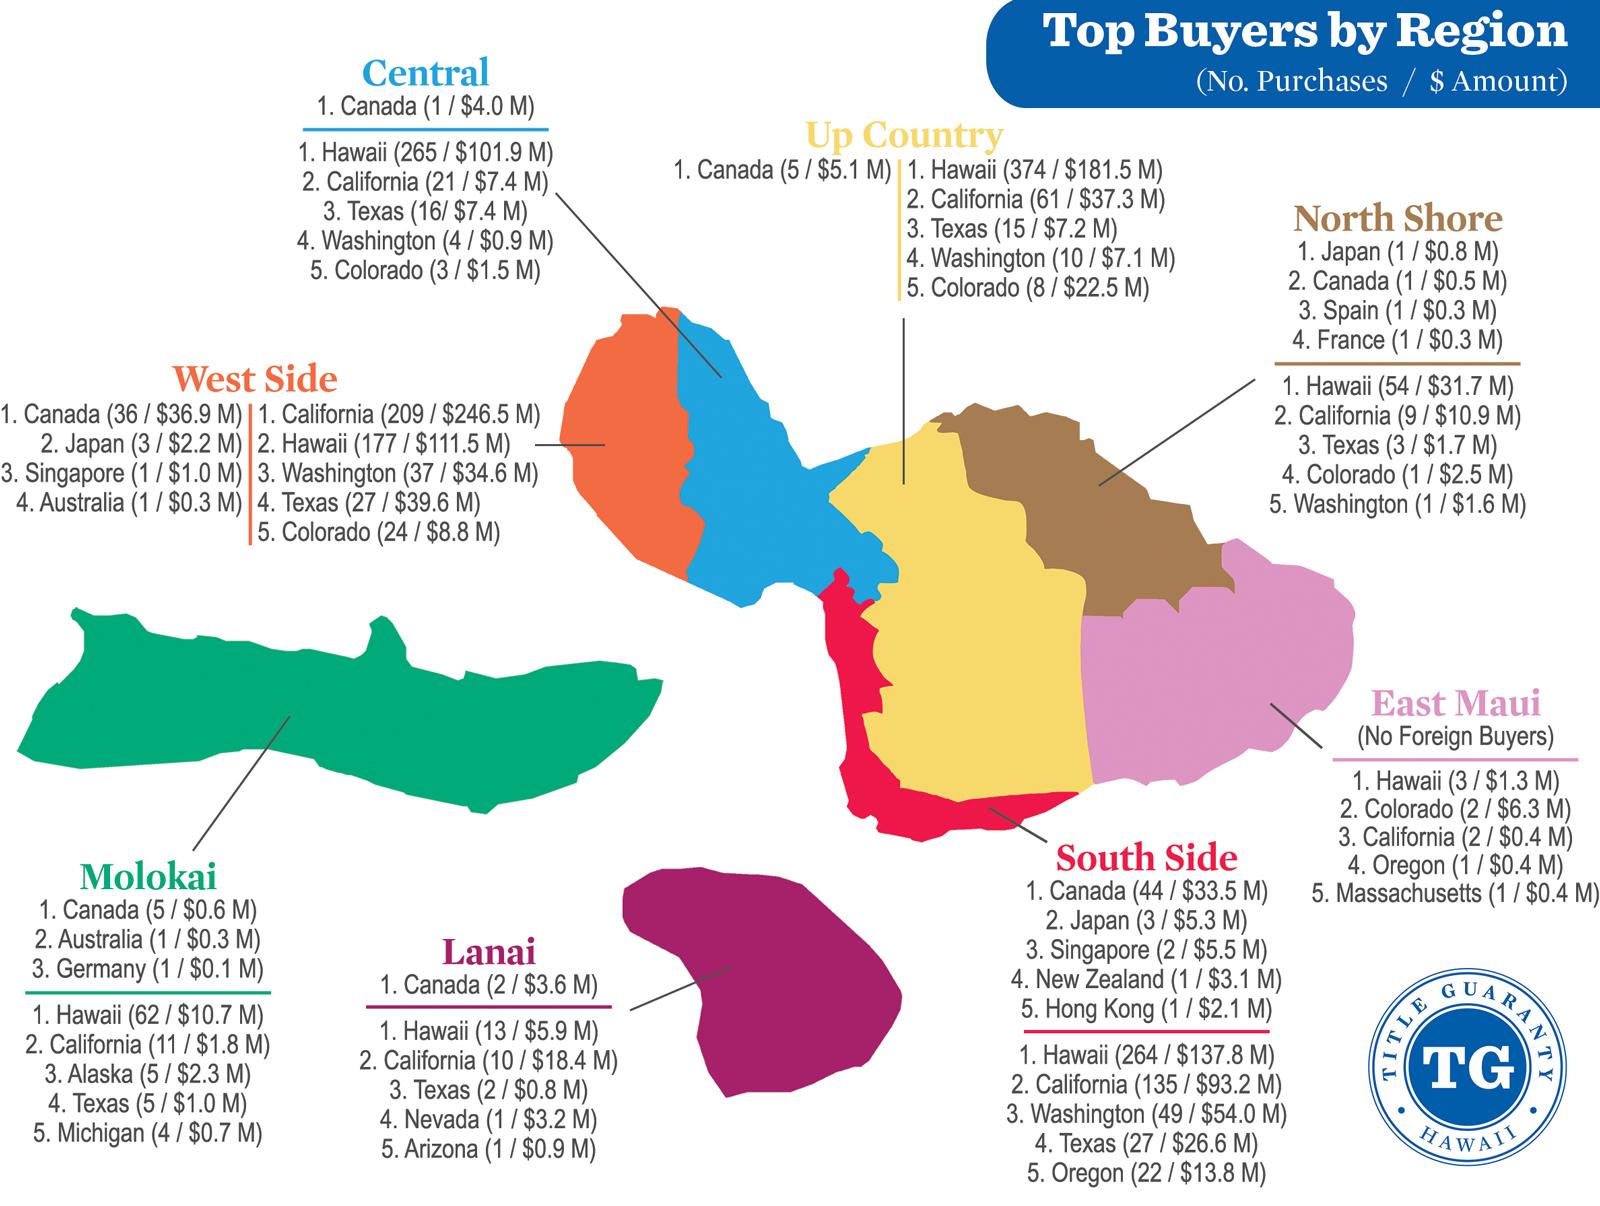 2014 Maui Buyer Statistics